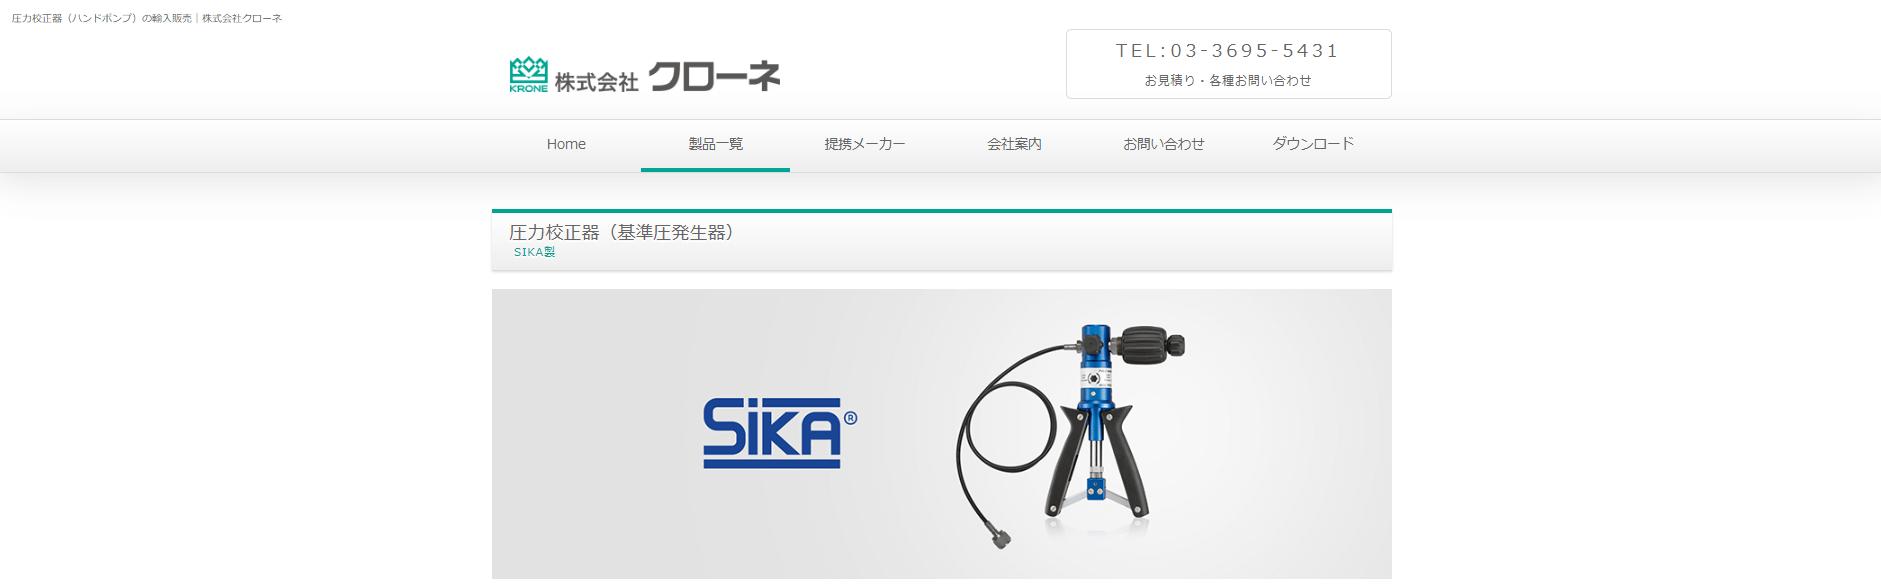 SIKA(ジカ)製